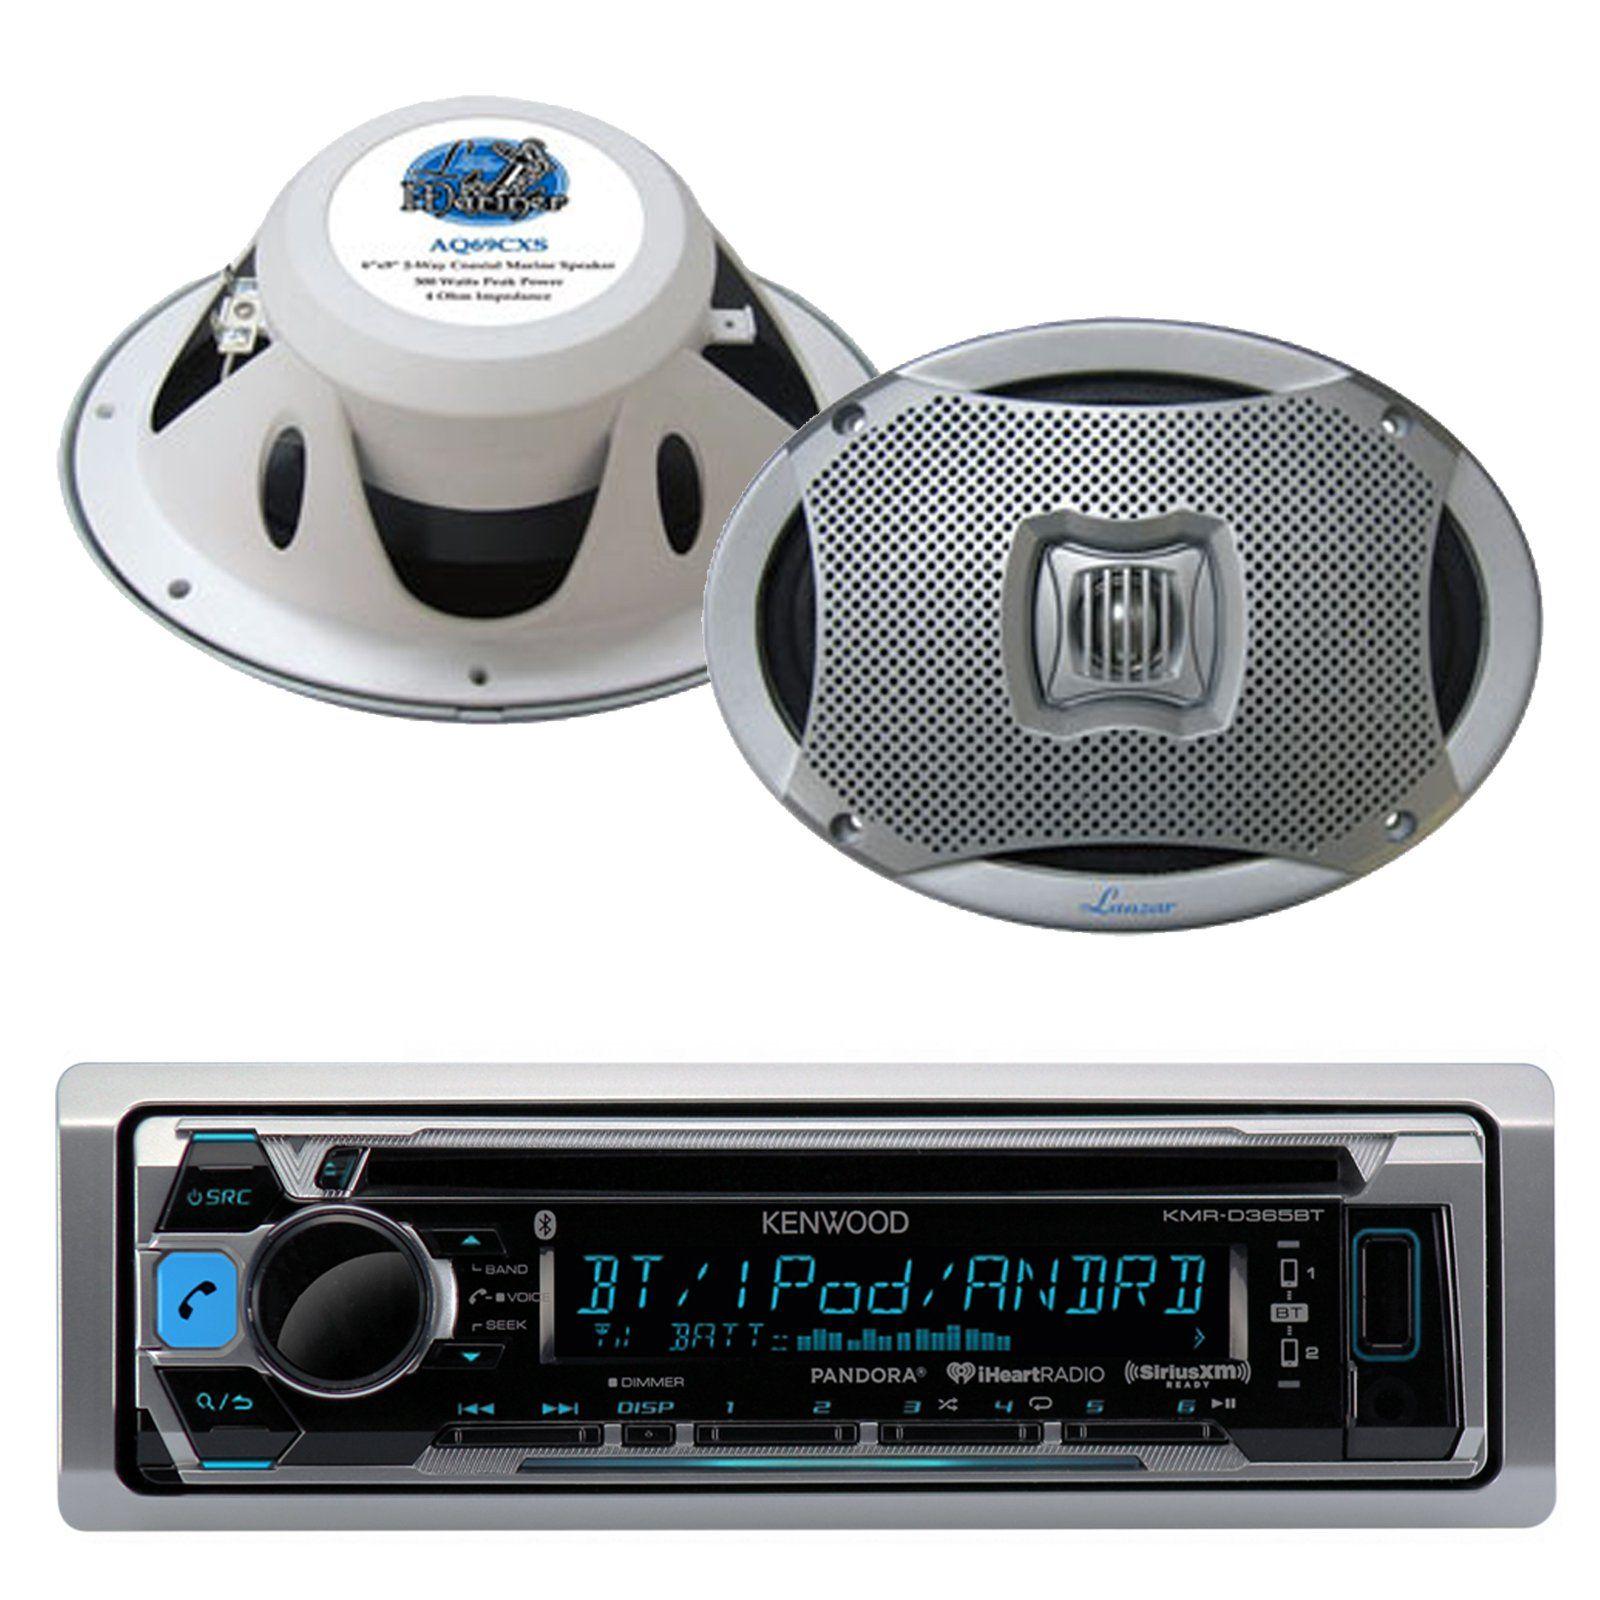 kenwood bluetooth usb cd ipod radio 2 lanzar 6x9 500w white marine speaker set [ 1600 x 1600 Pixel ]